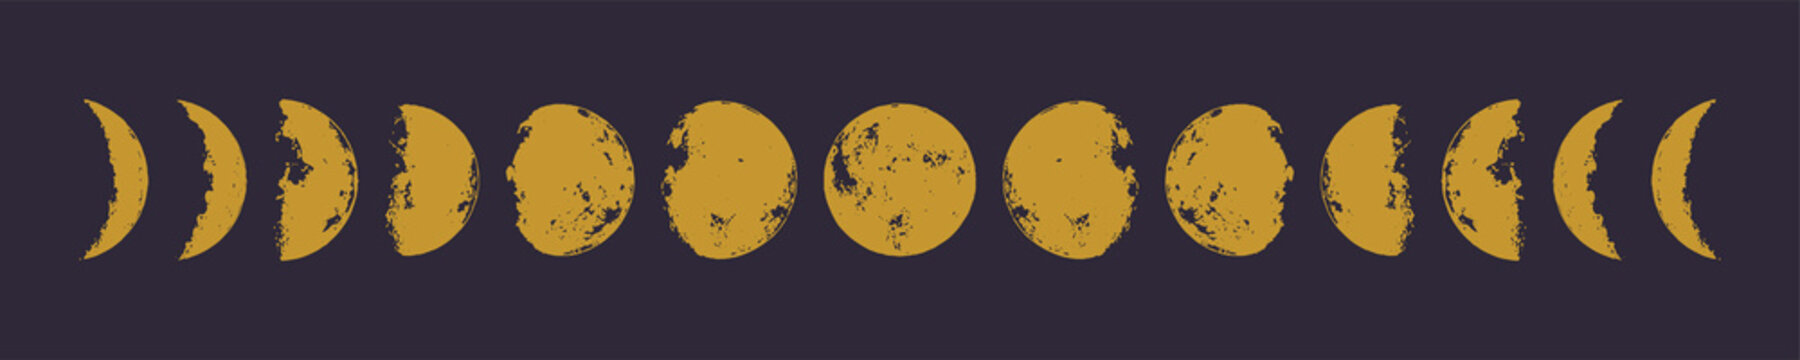 Golden moon phases. Hand drawn vector illustration. Eps 10.